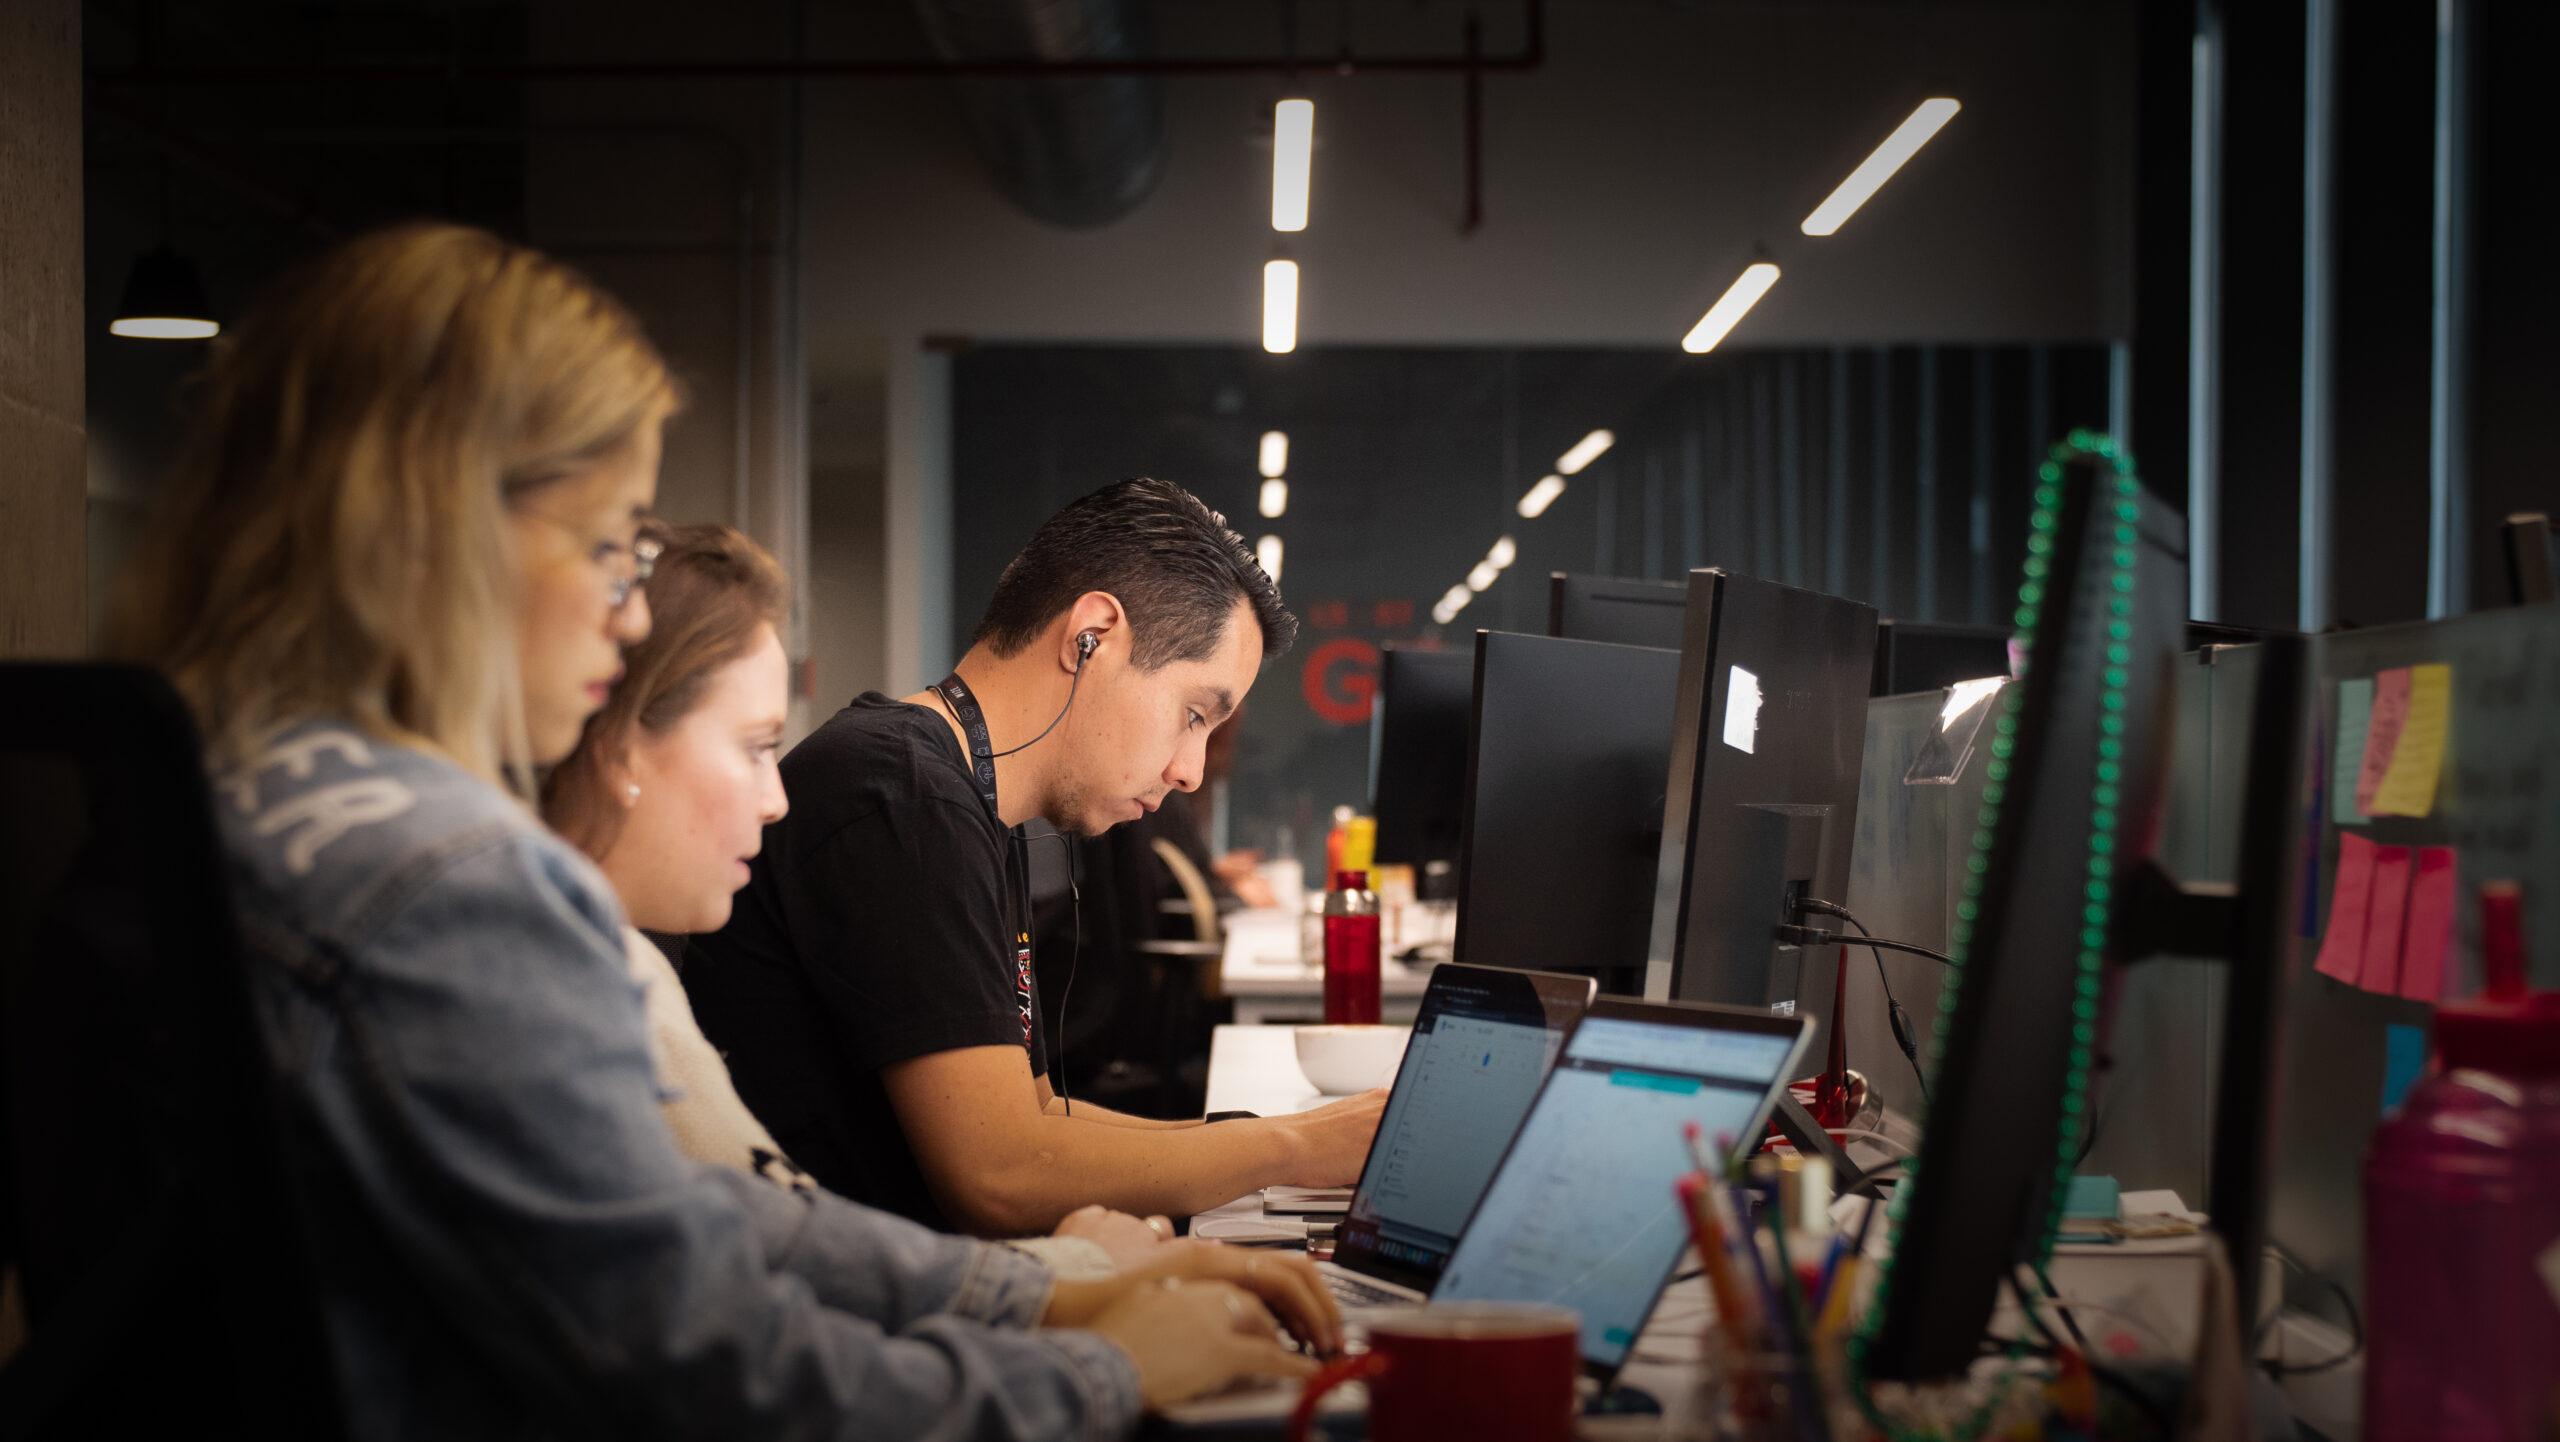 Product development team